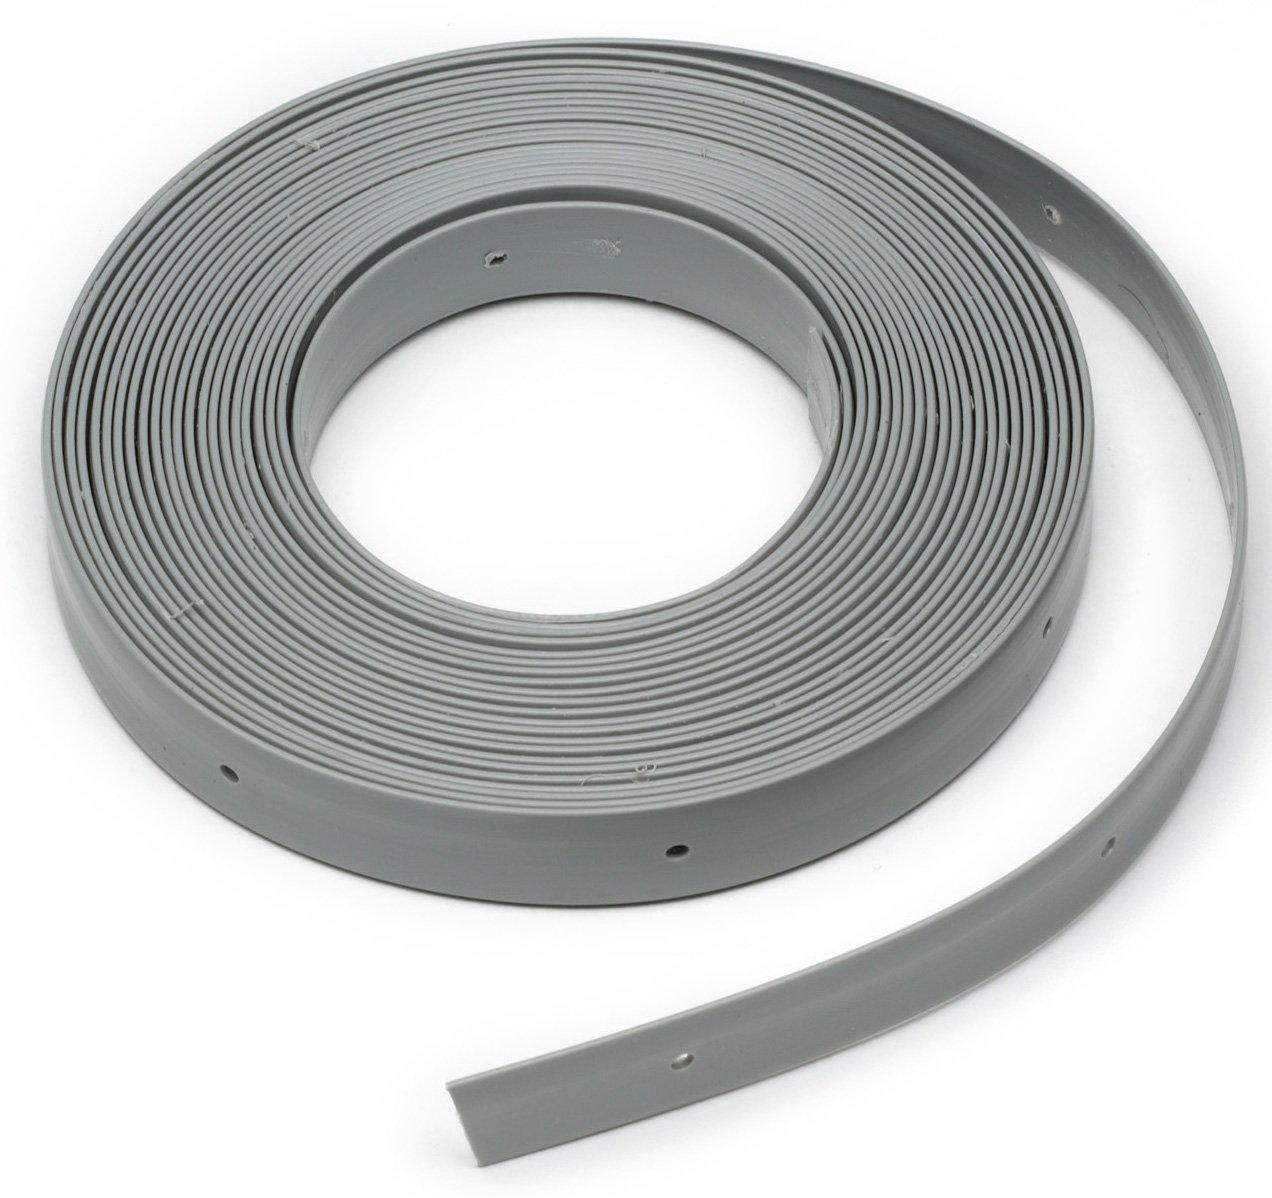 Oatey 33927 Securing Straps, 3/4'' x 100', 3/4-Inch by 100-Foot by Oatey